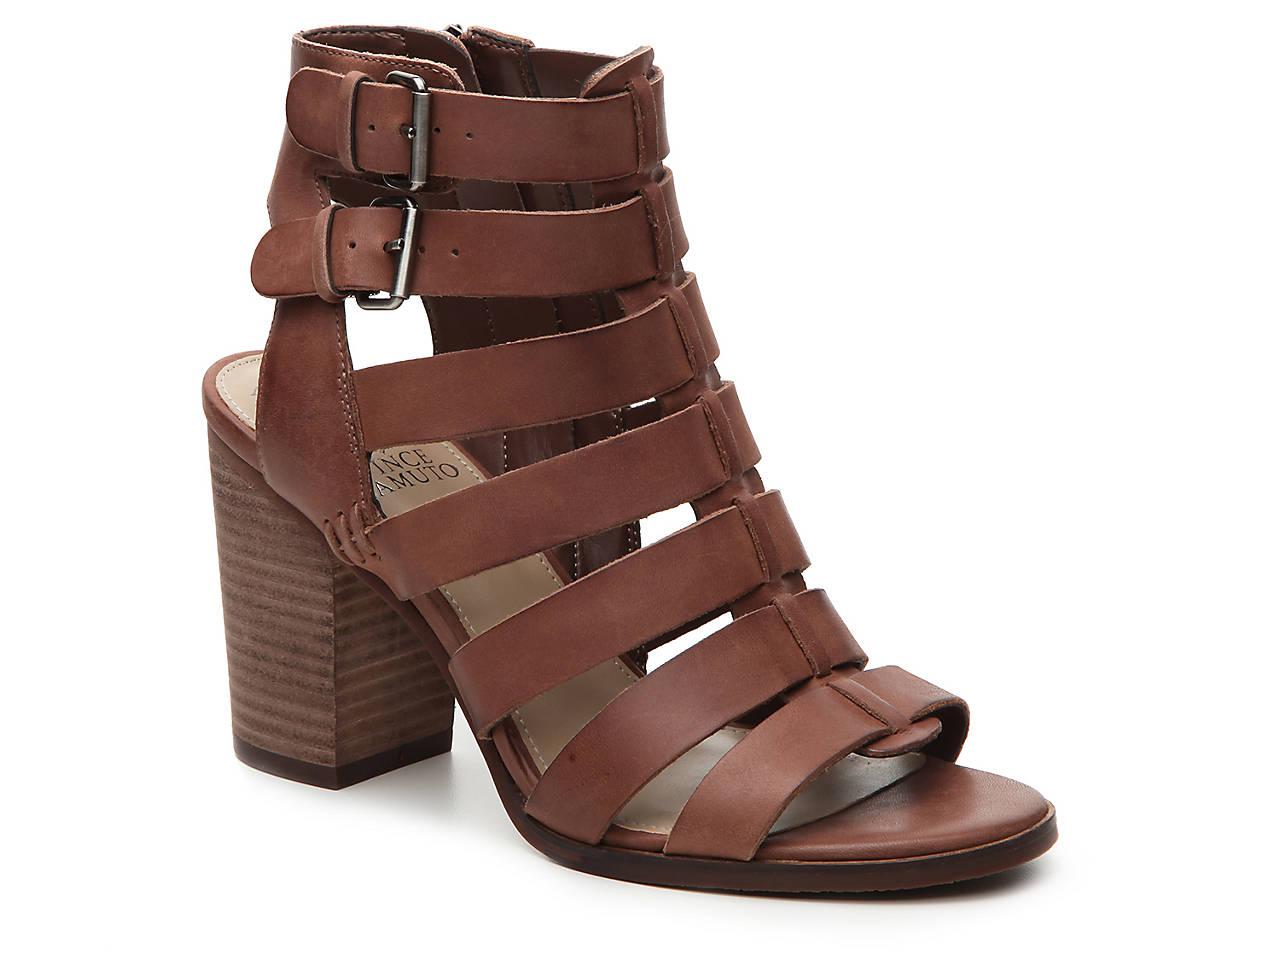 38da443b586 Vince Camuto Javrina Gladiator Sandal Women s Shoes